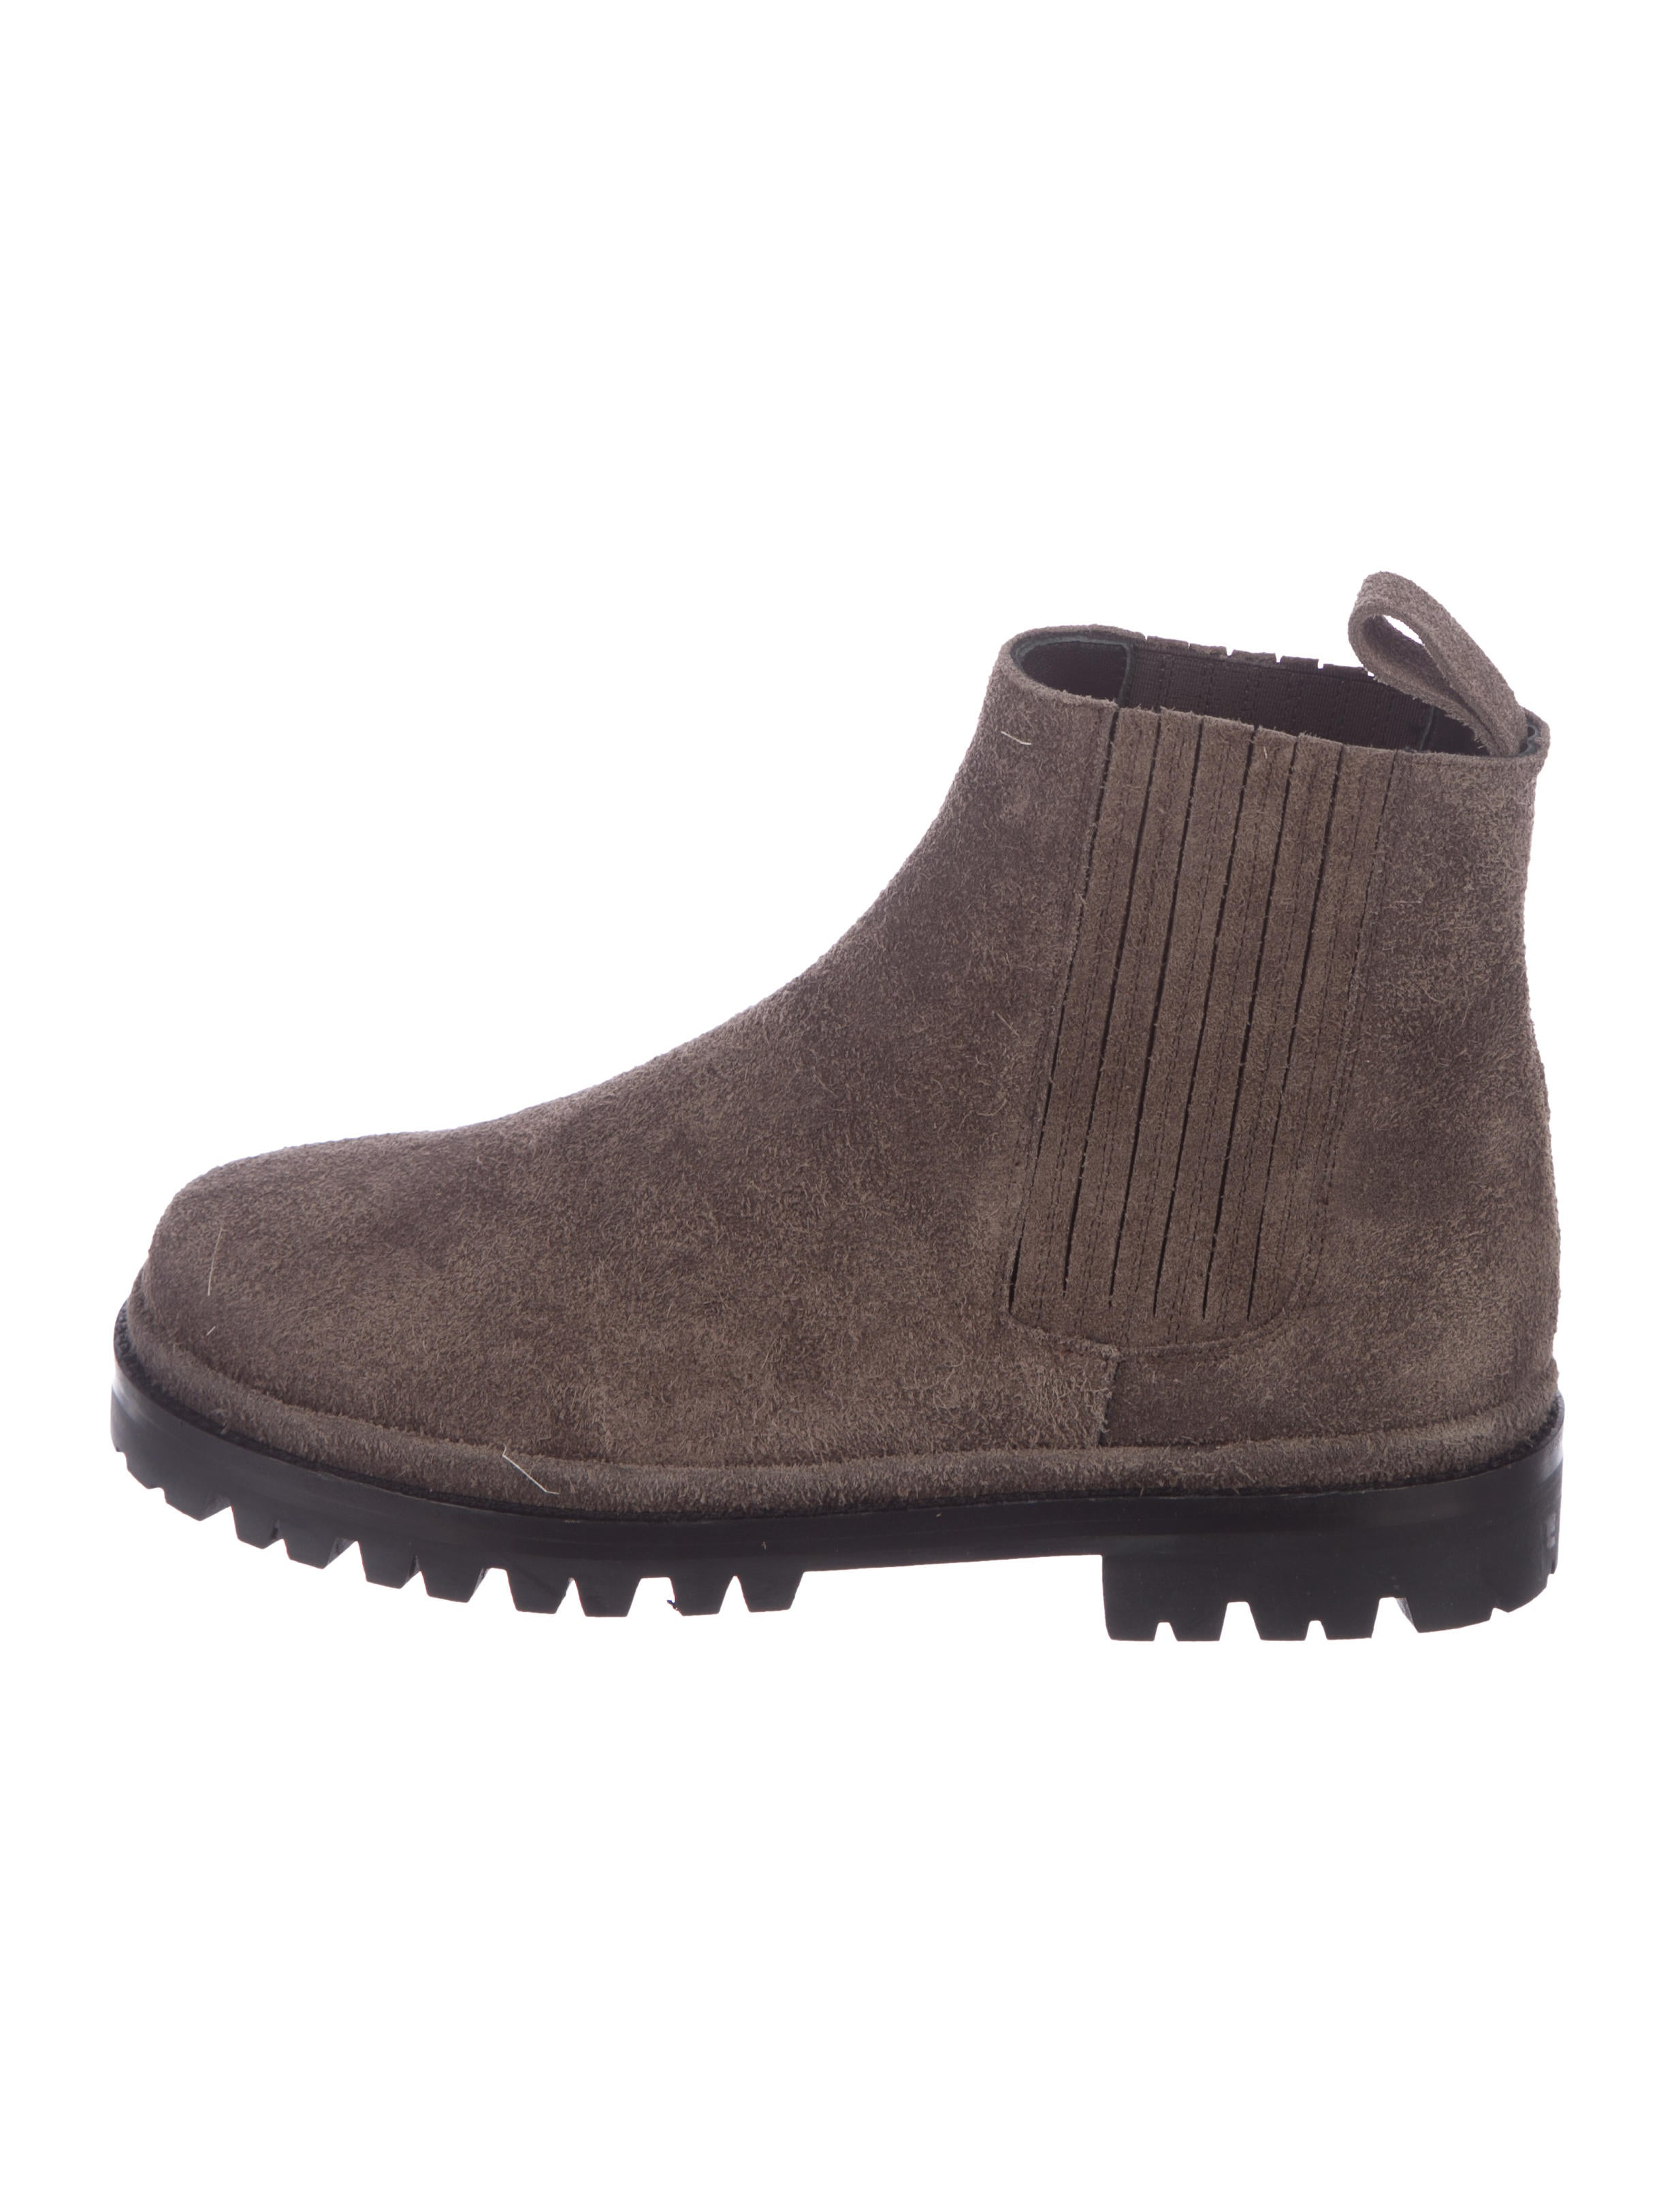 5e1a3657d17f Helmut Lang Suede Combat Ankle Boots w  Tags - Shoes - WHELM83400 ...